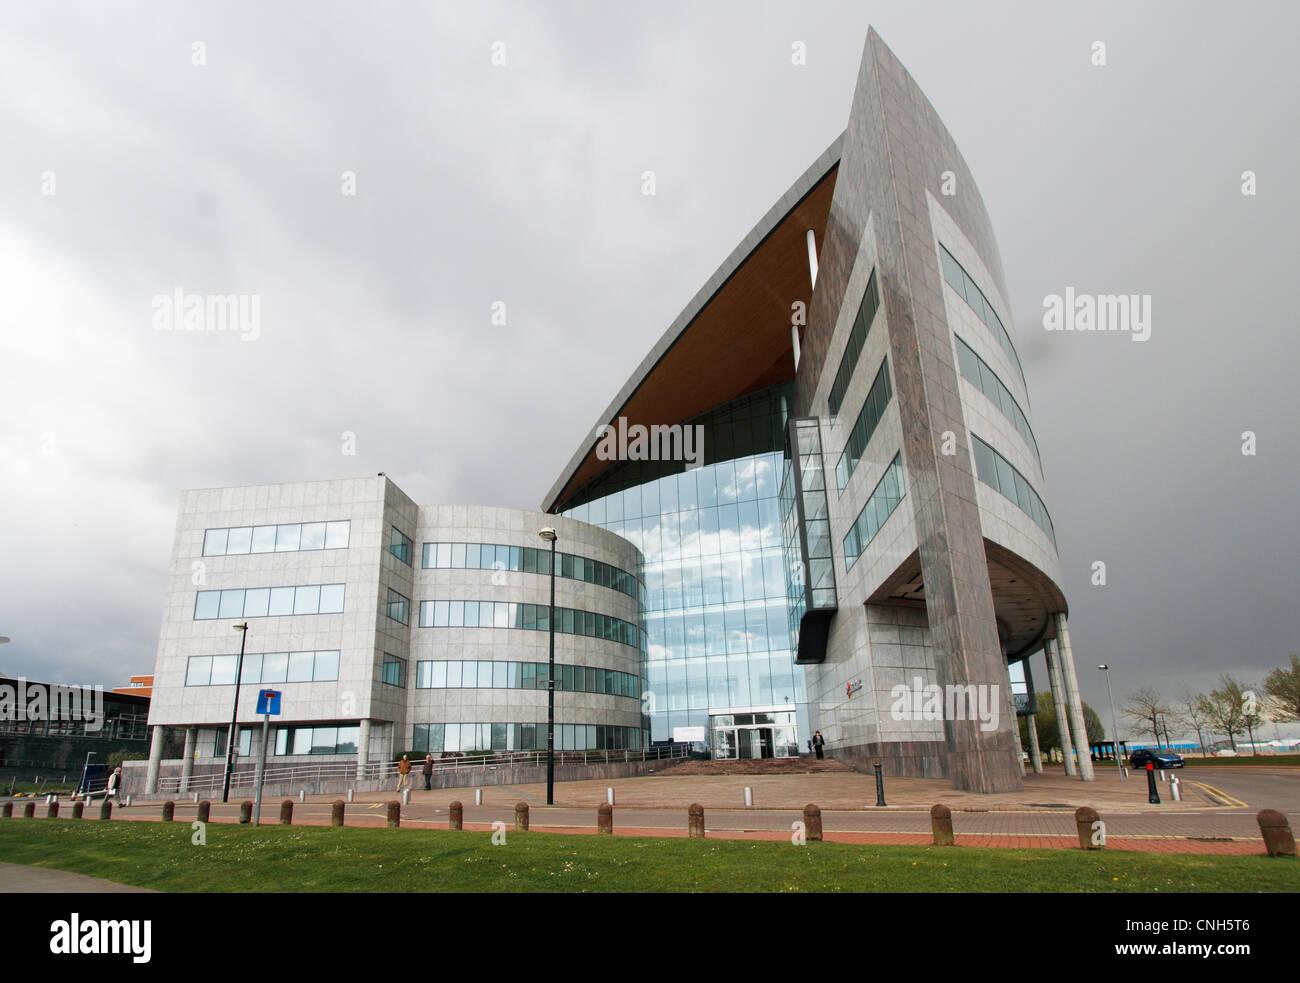 Cardiff Docks - Atradius Credit Insurers building - Stock Image